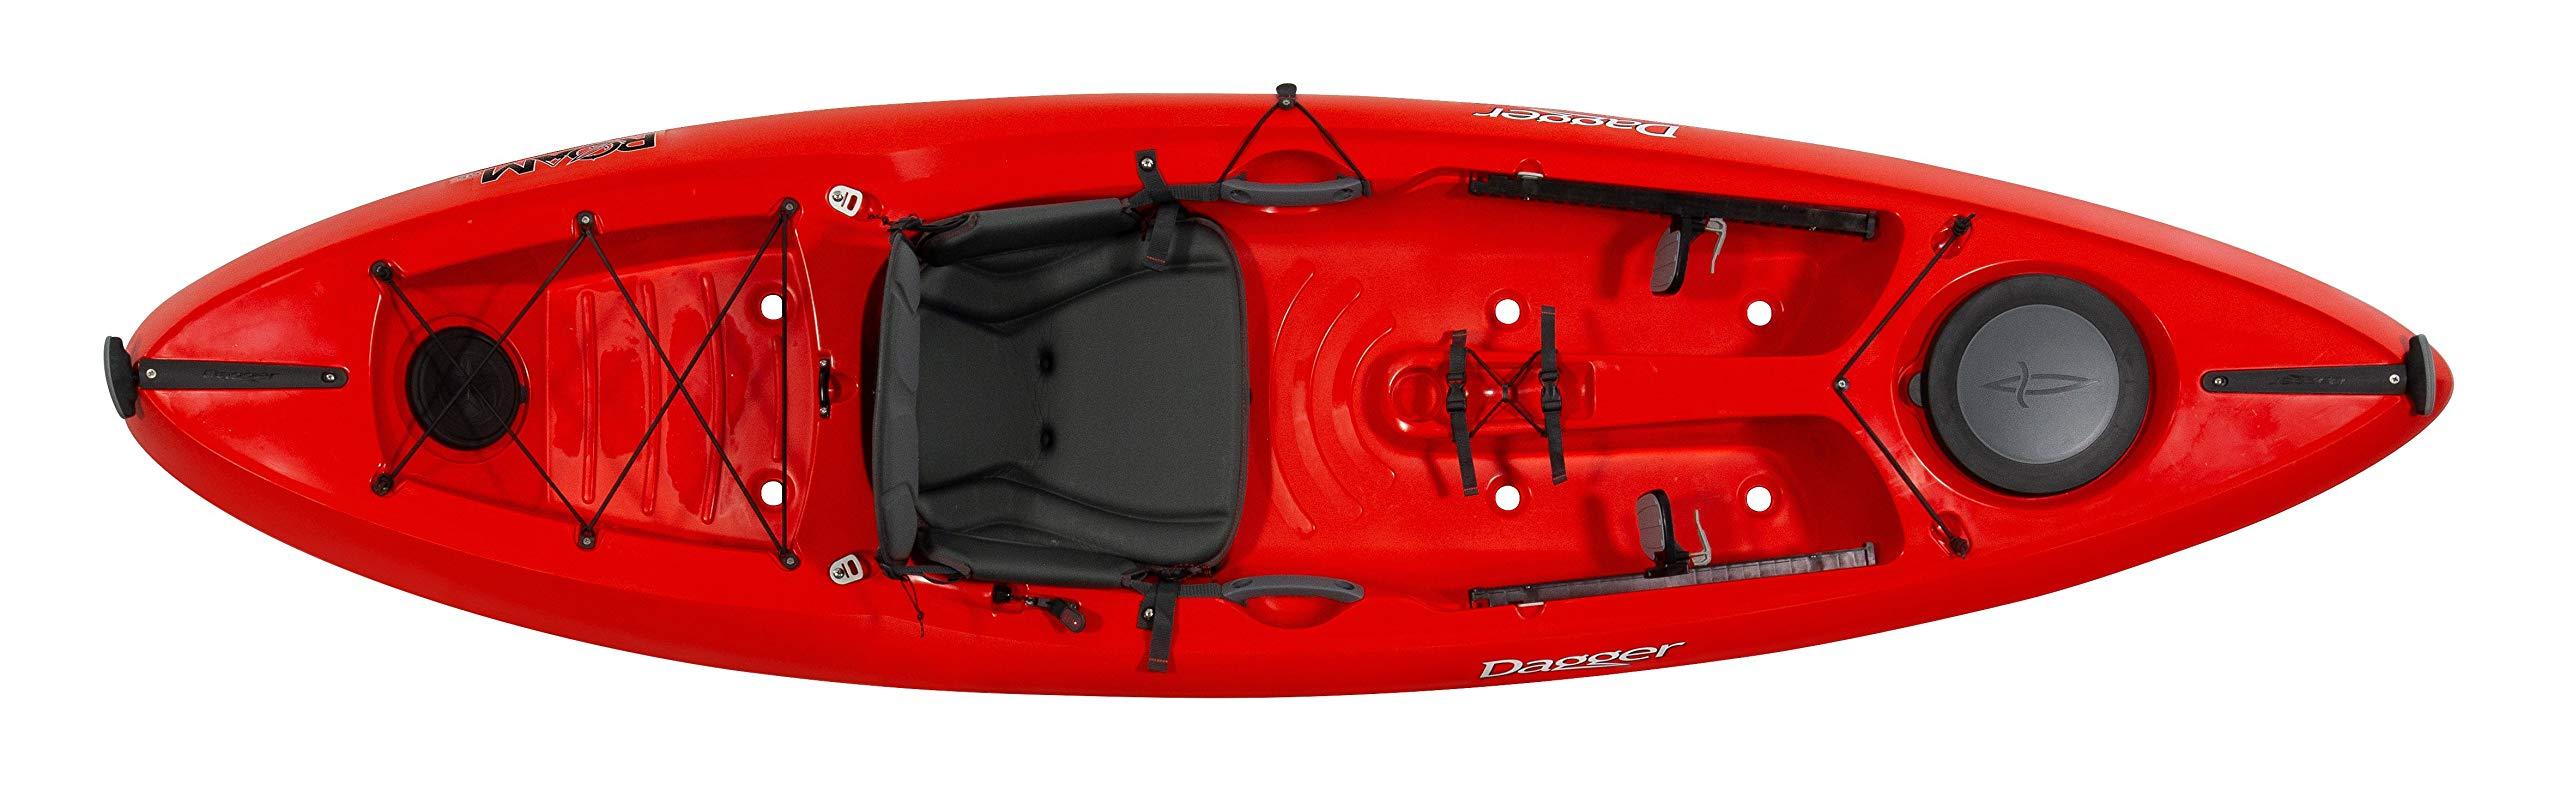 Dagger 2020 Roam 9.5 Recreational Multiwater Sit on Top Kayak by Dagger